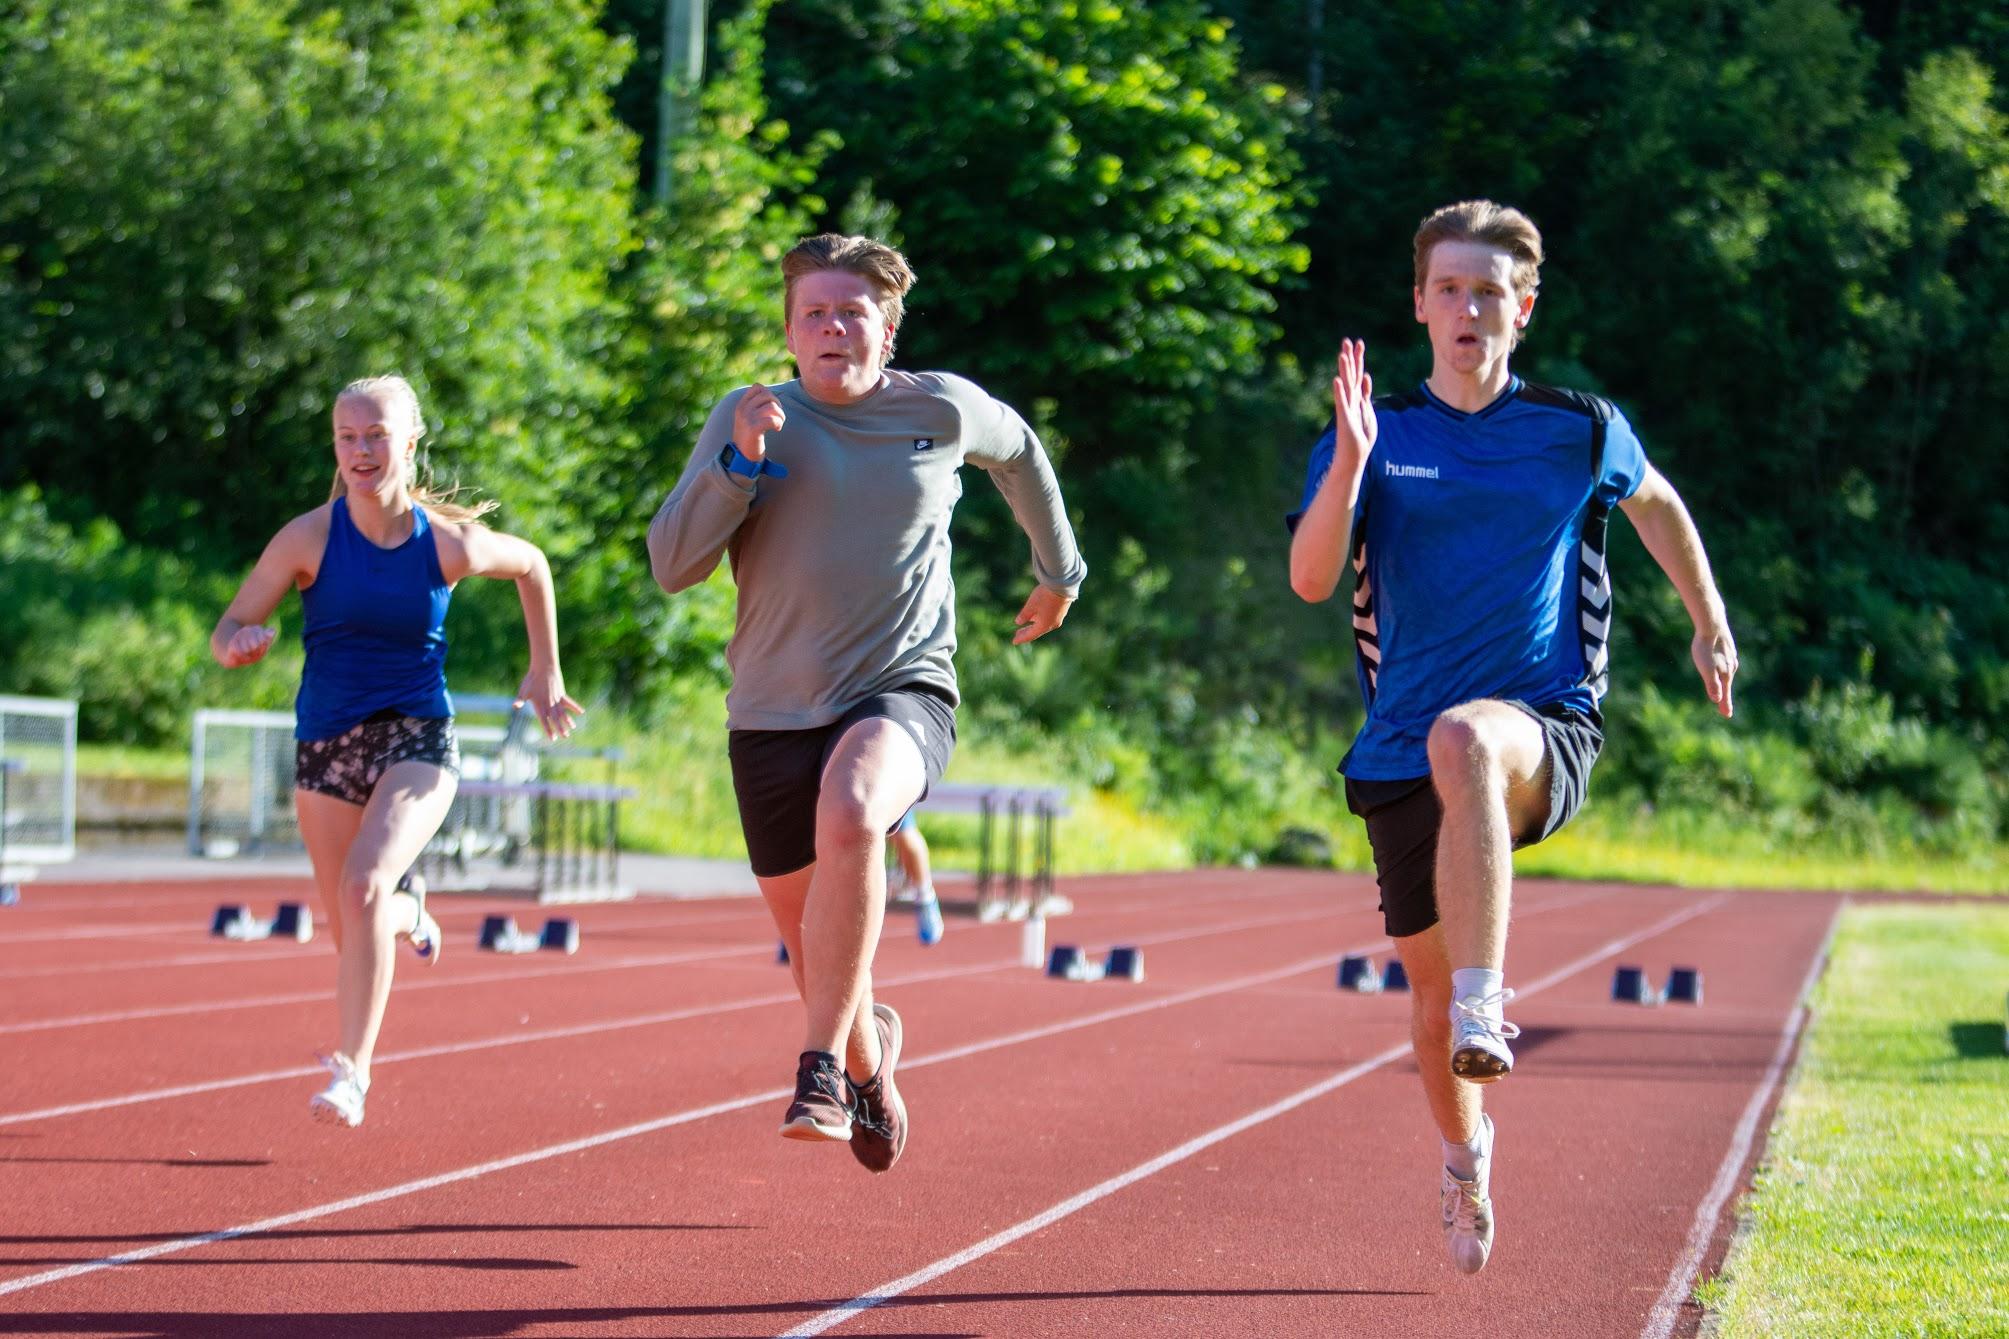 Heatoppsett løp Telemarkskarusellen 1 20. juni 2020